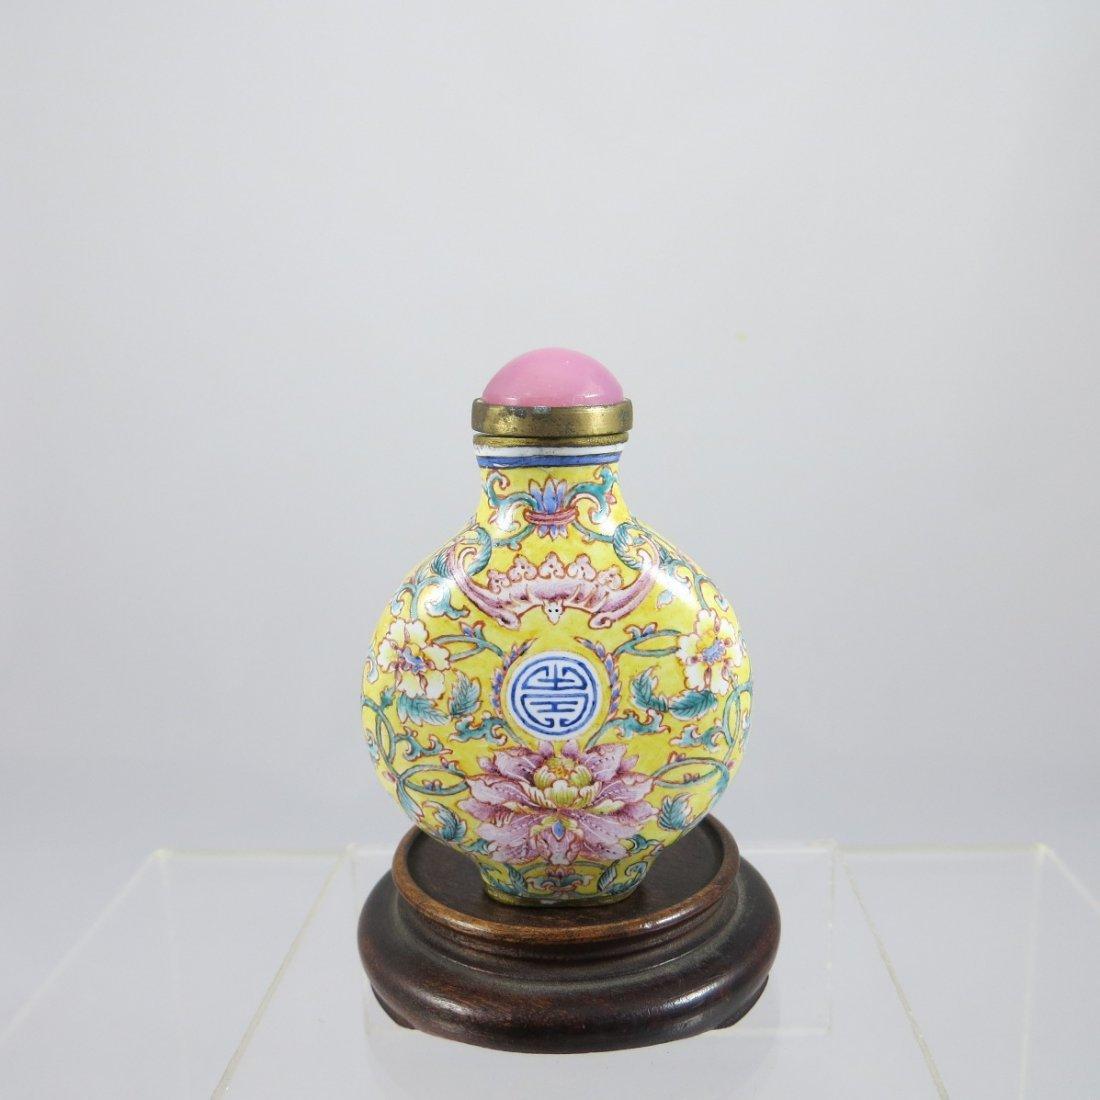 Chinese Qing Dynasty Enamel Snuff Bottle